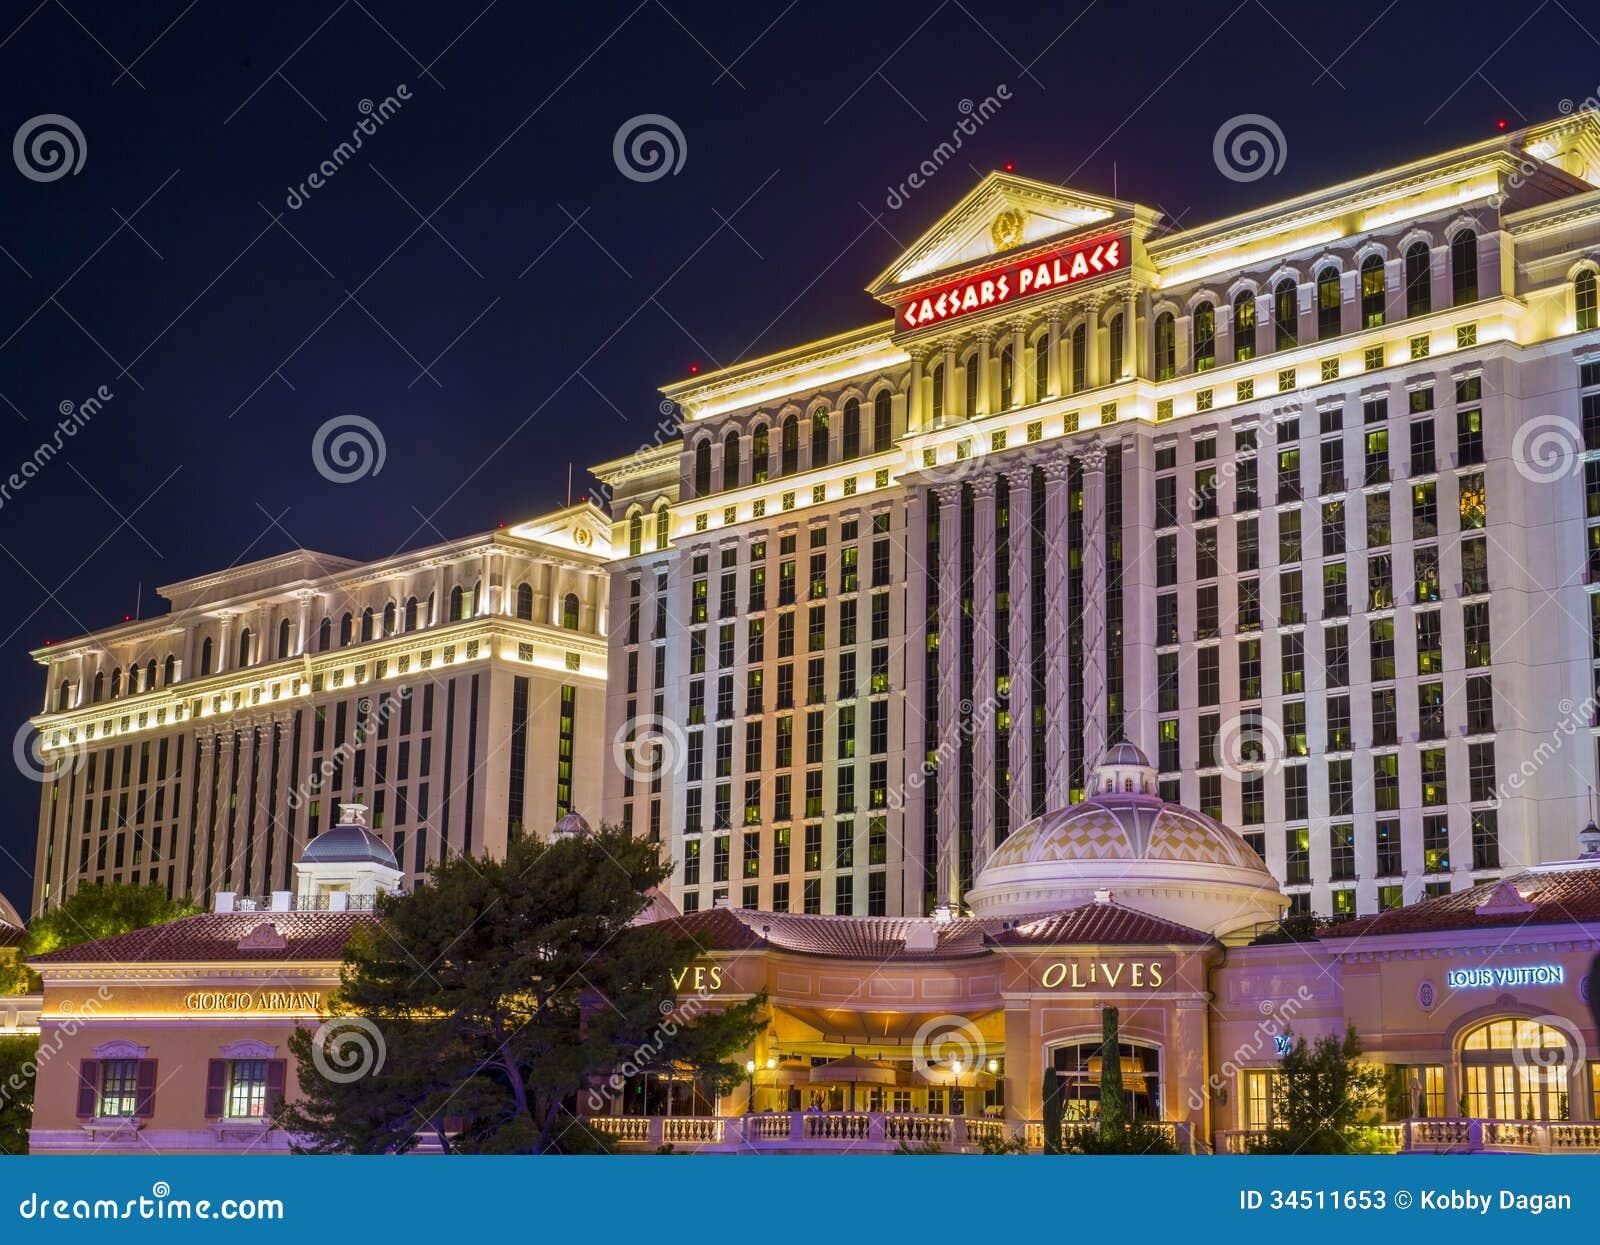 caesars palace online casino river queen